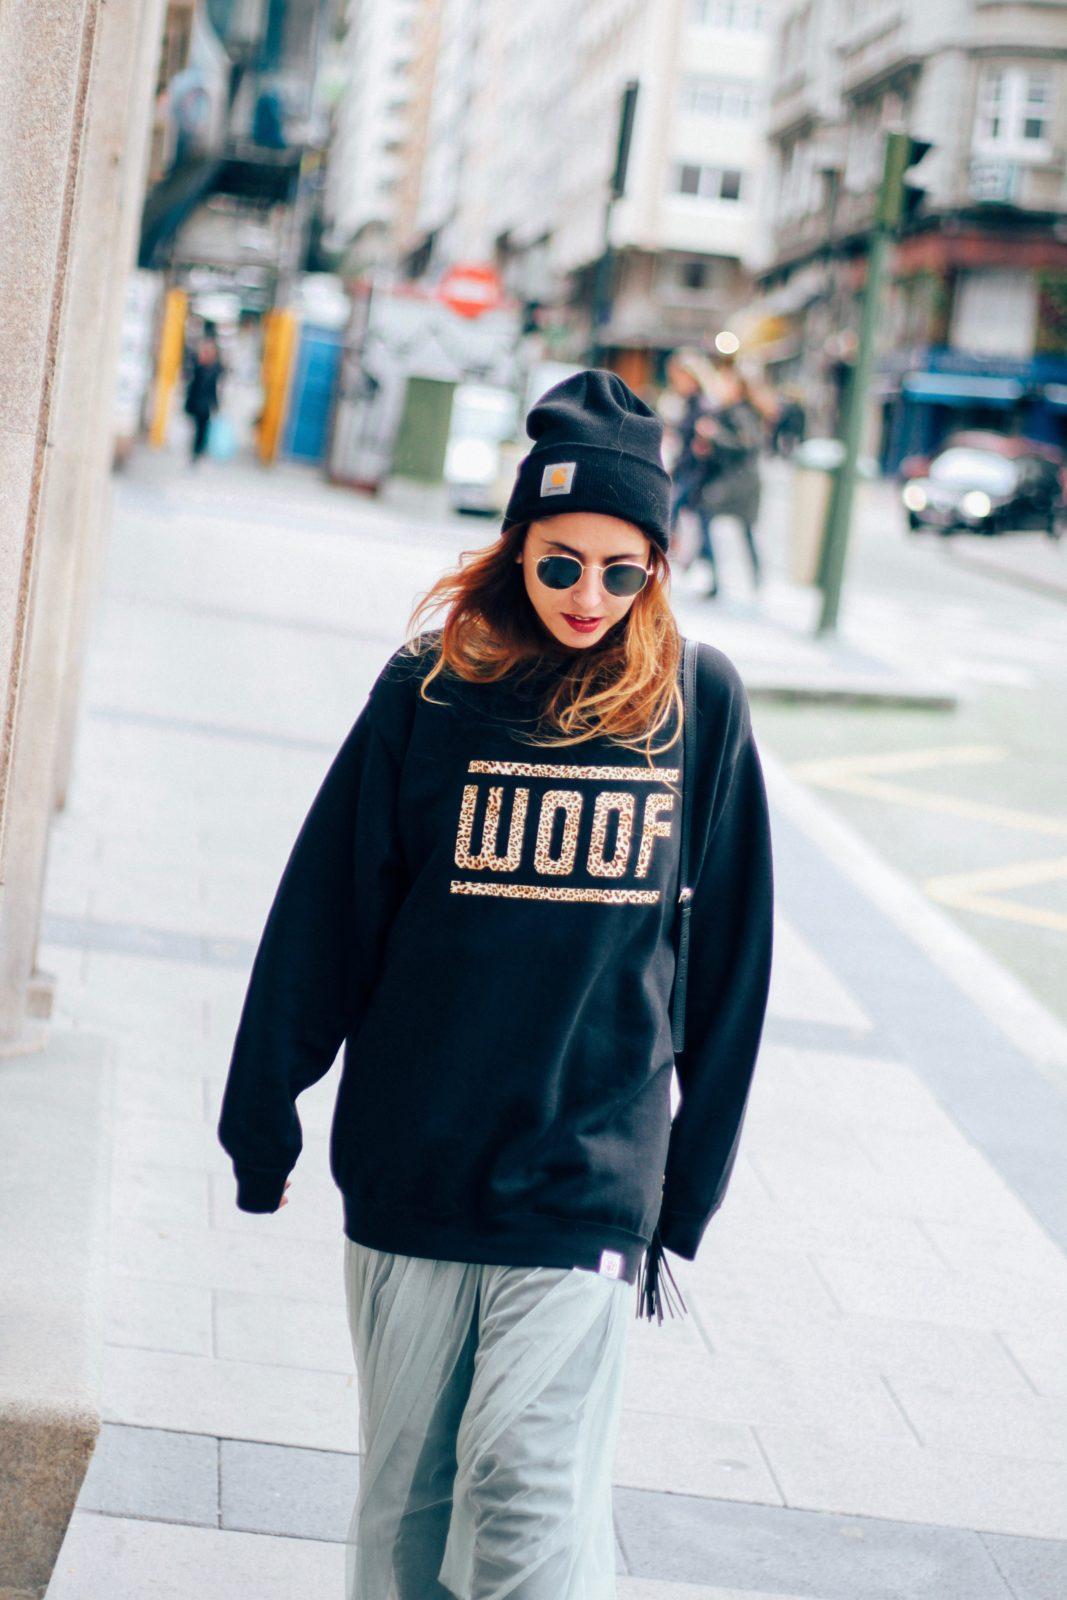 sudadera_old_dogs_falda_de_tul_vans_beanie_carhartt_look_donkeycool_street_style-30